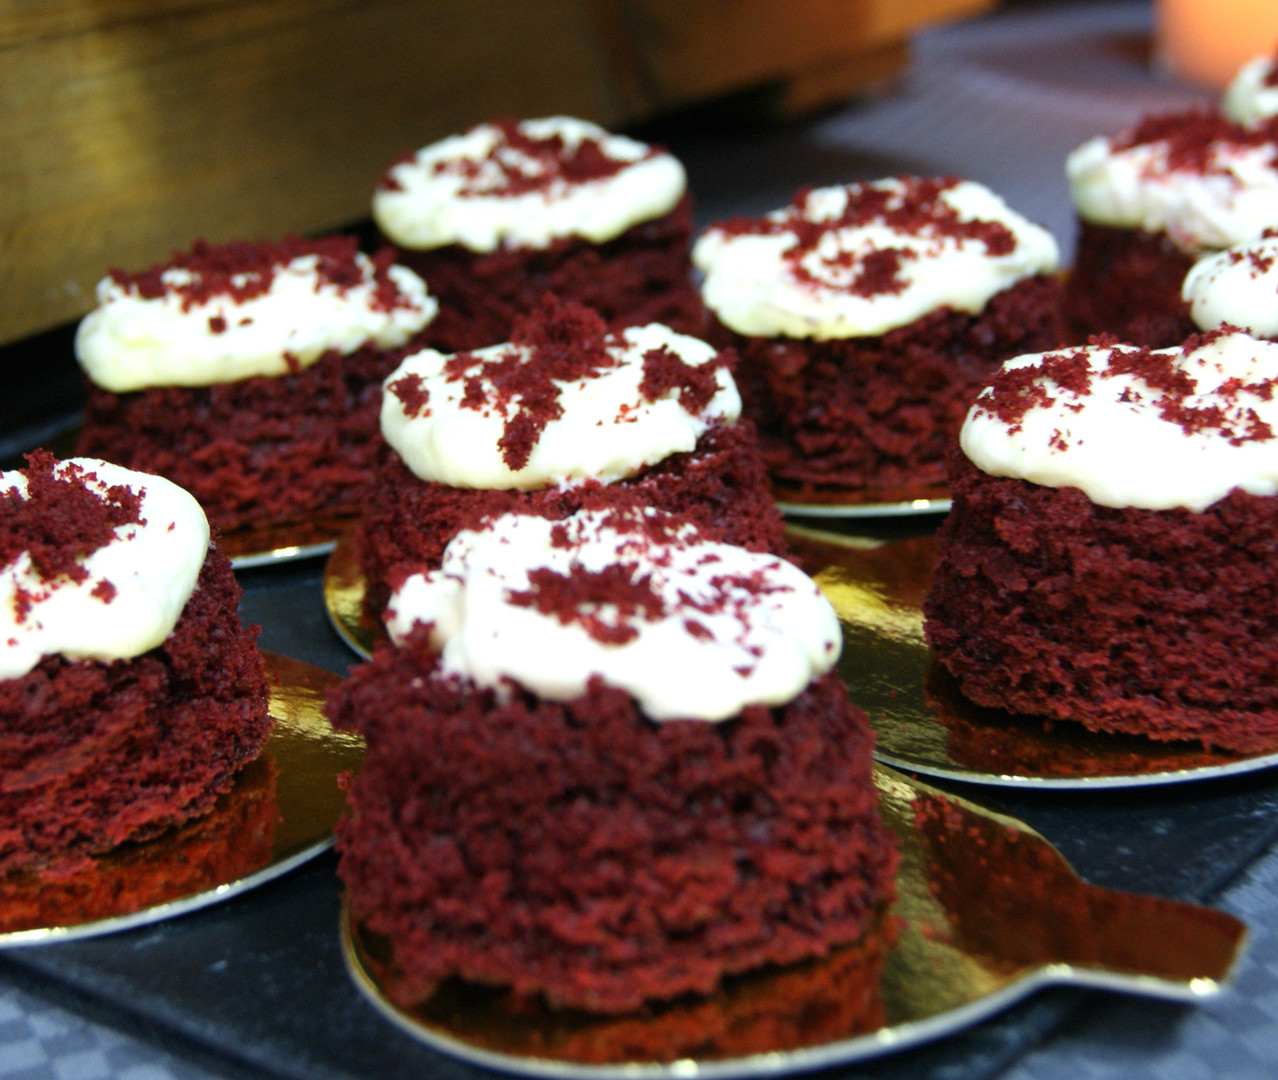 sibarum-cakes-polonia-elmusical-candybar-redvelvet2